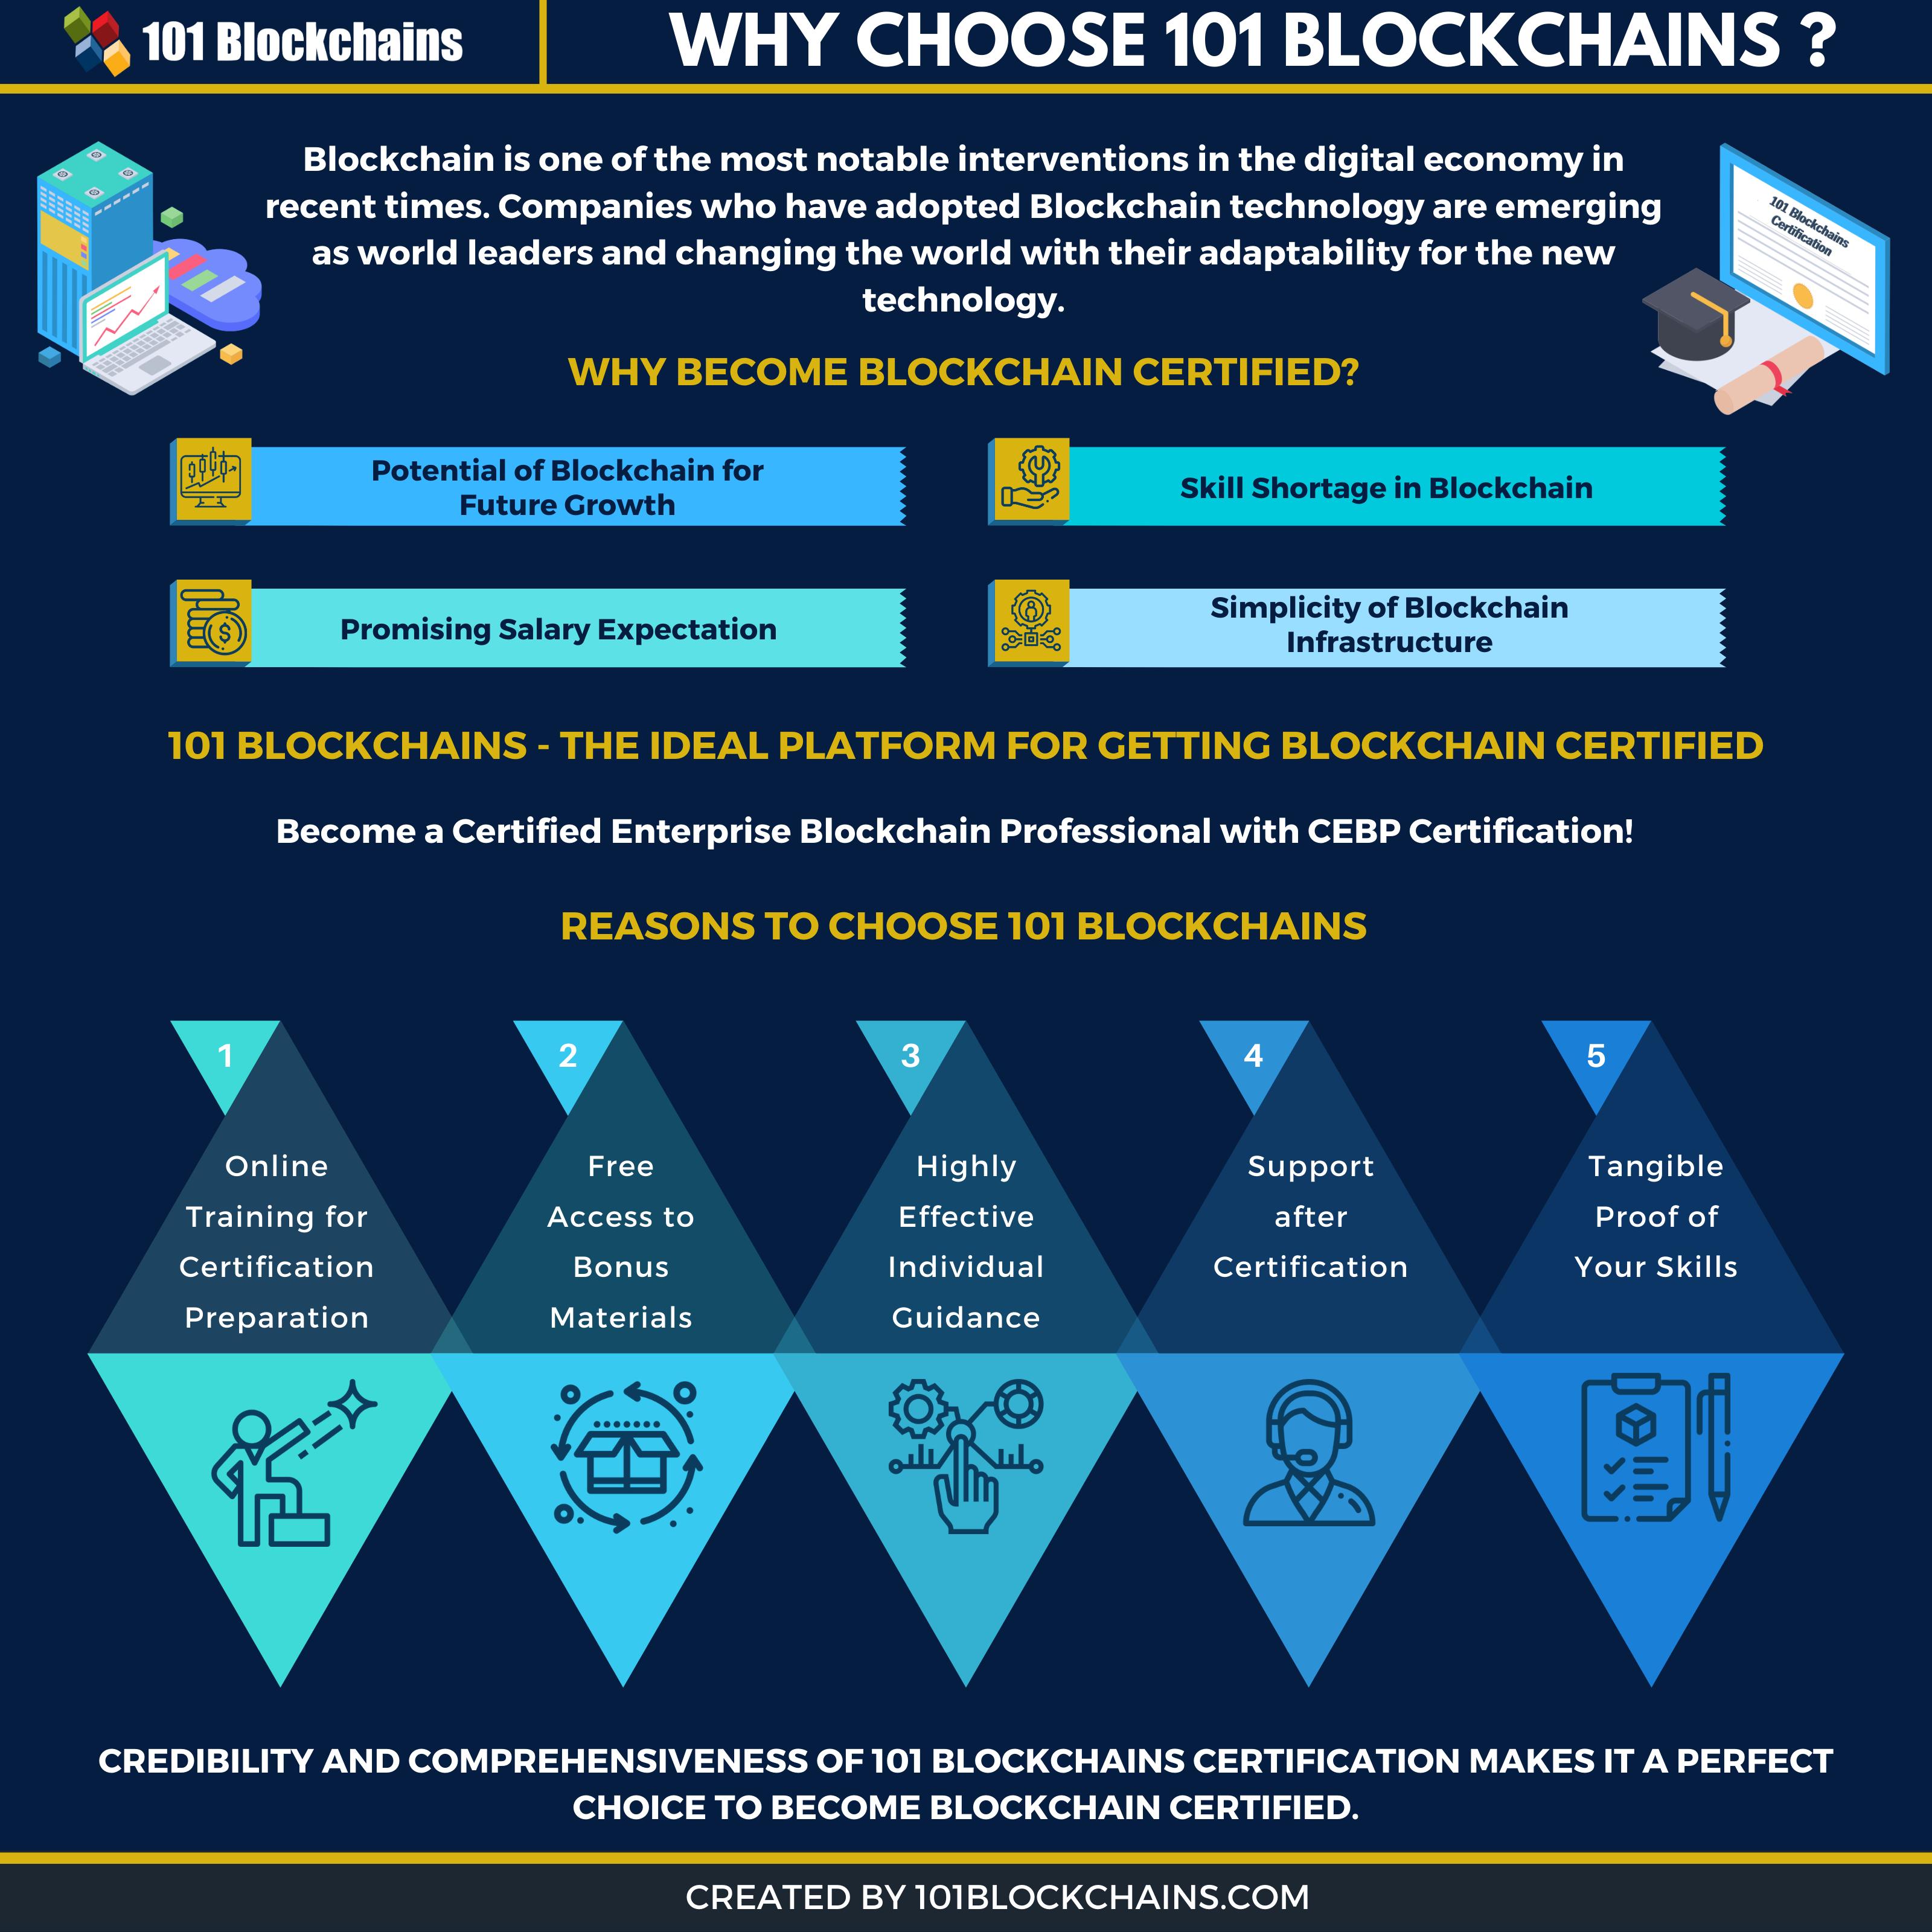 Why choose 101 Blockchains